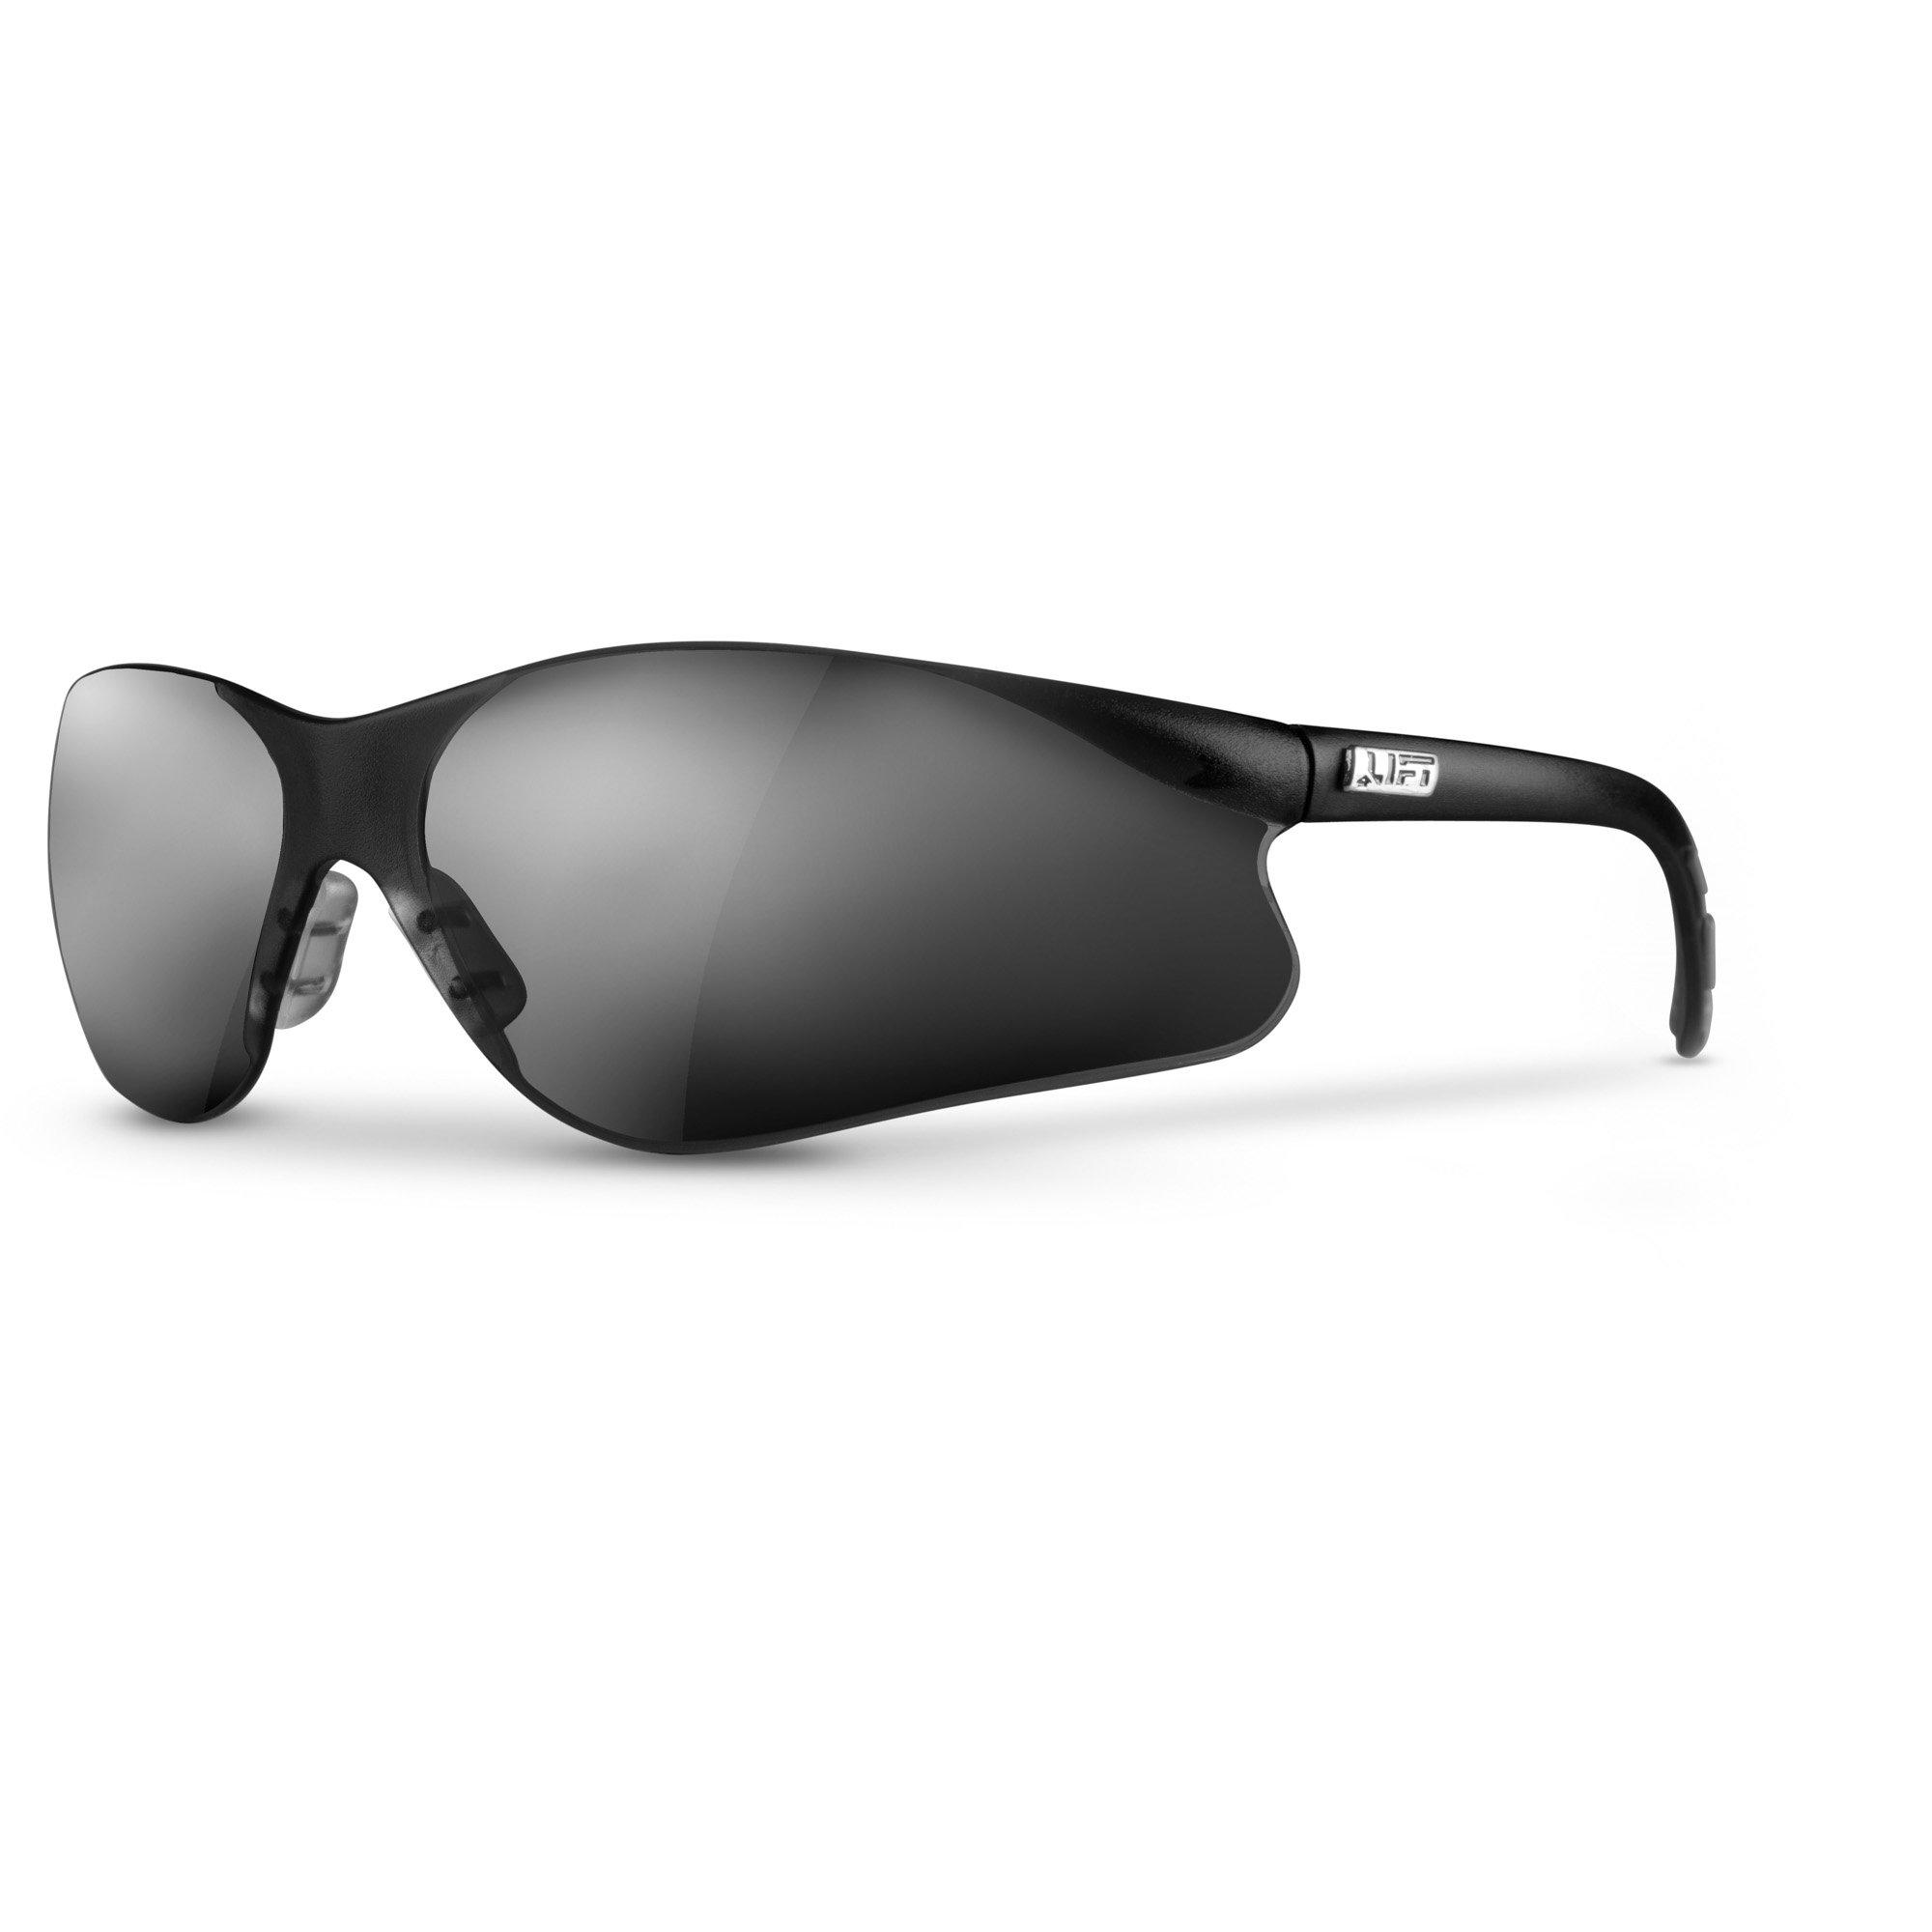 LIFT Safety Sectorlite Safety Glasses (Black Frame/Smoke Lens)